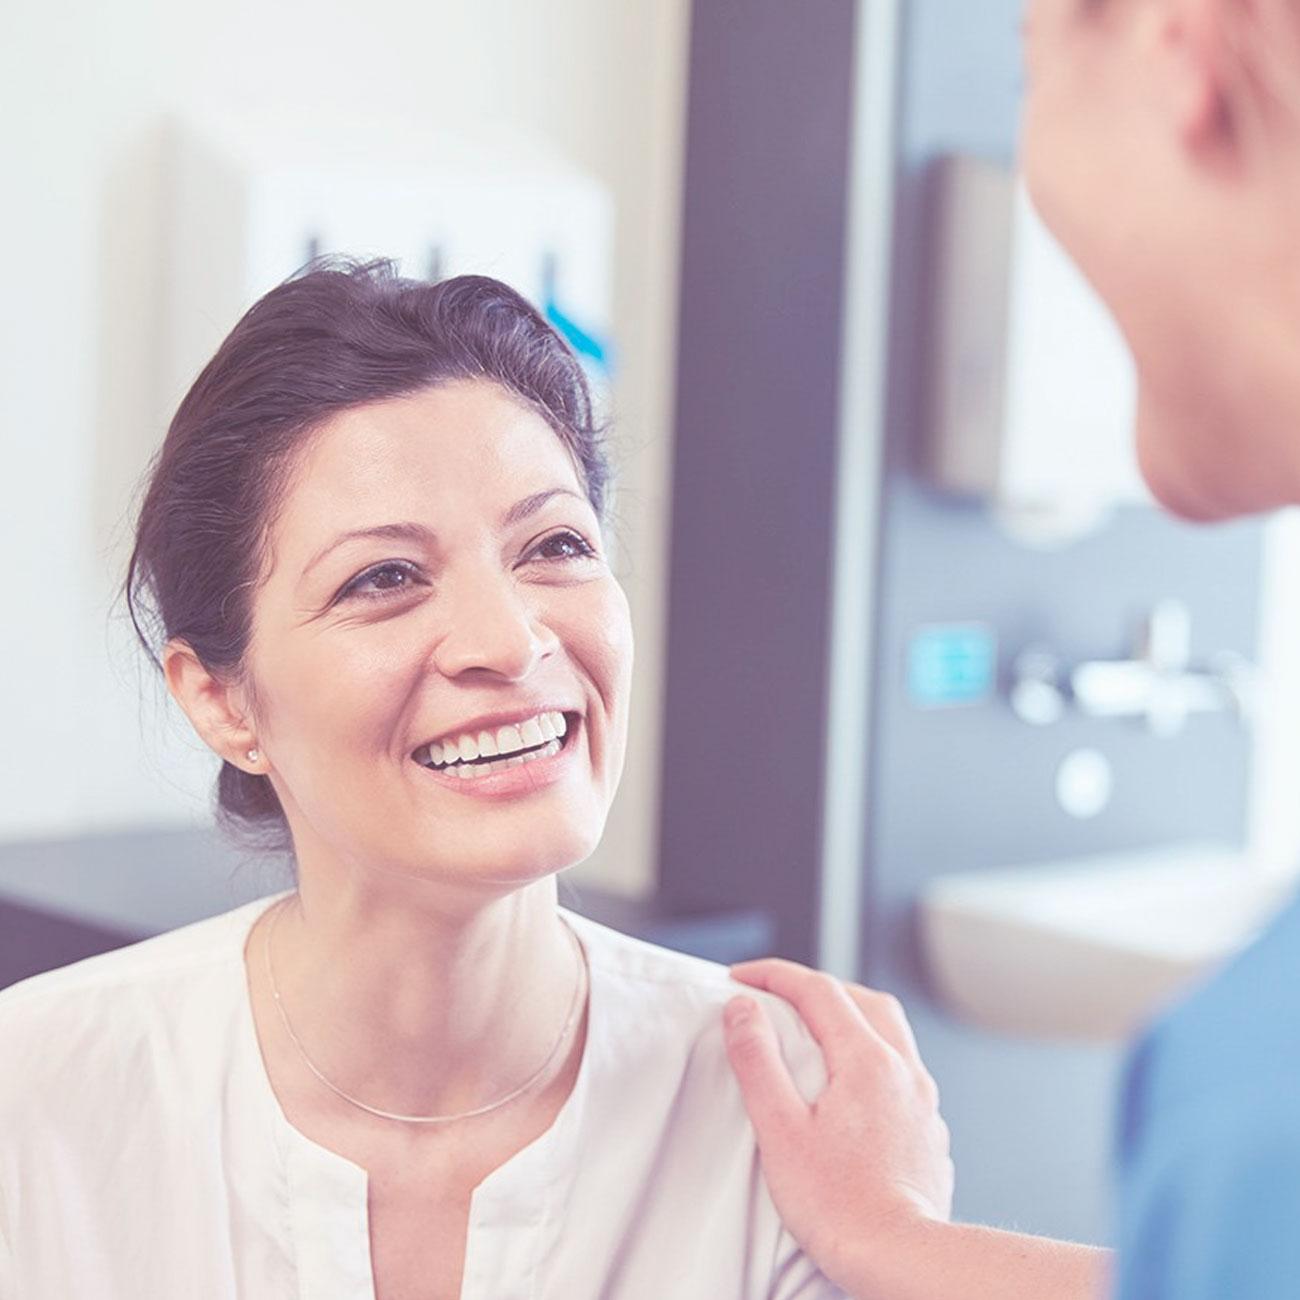 Mejores ginecologos en madrid